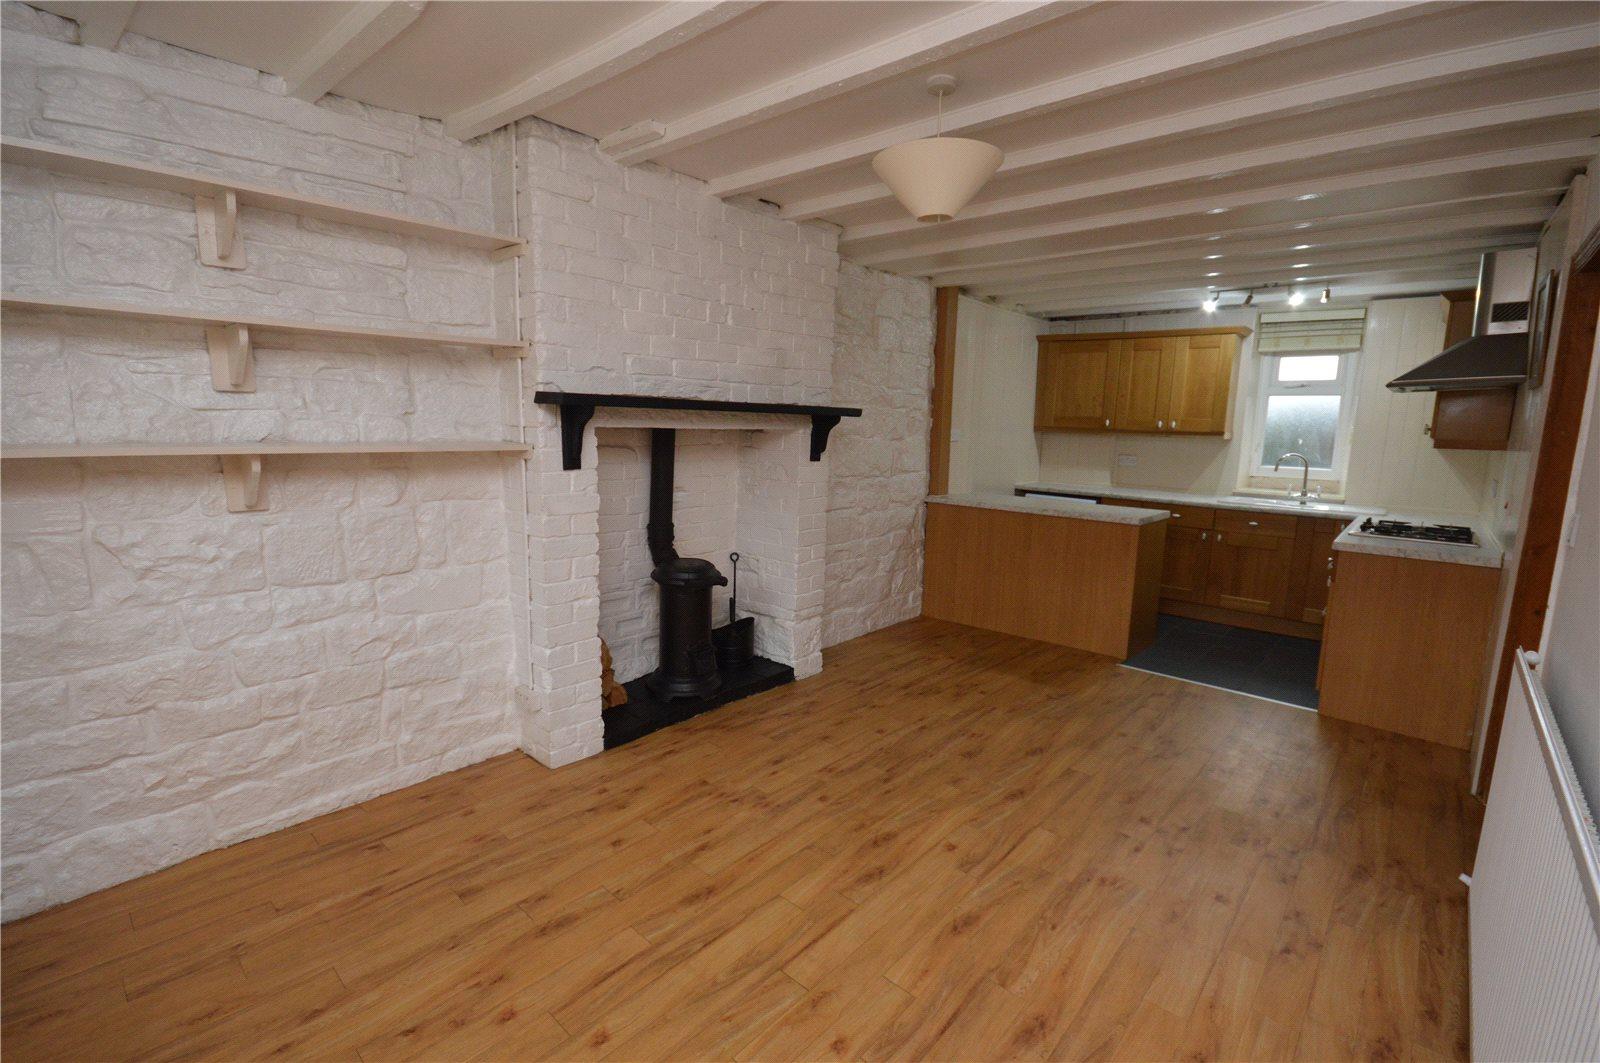 property for sale in Calverley, interior kitchen open plan